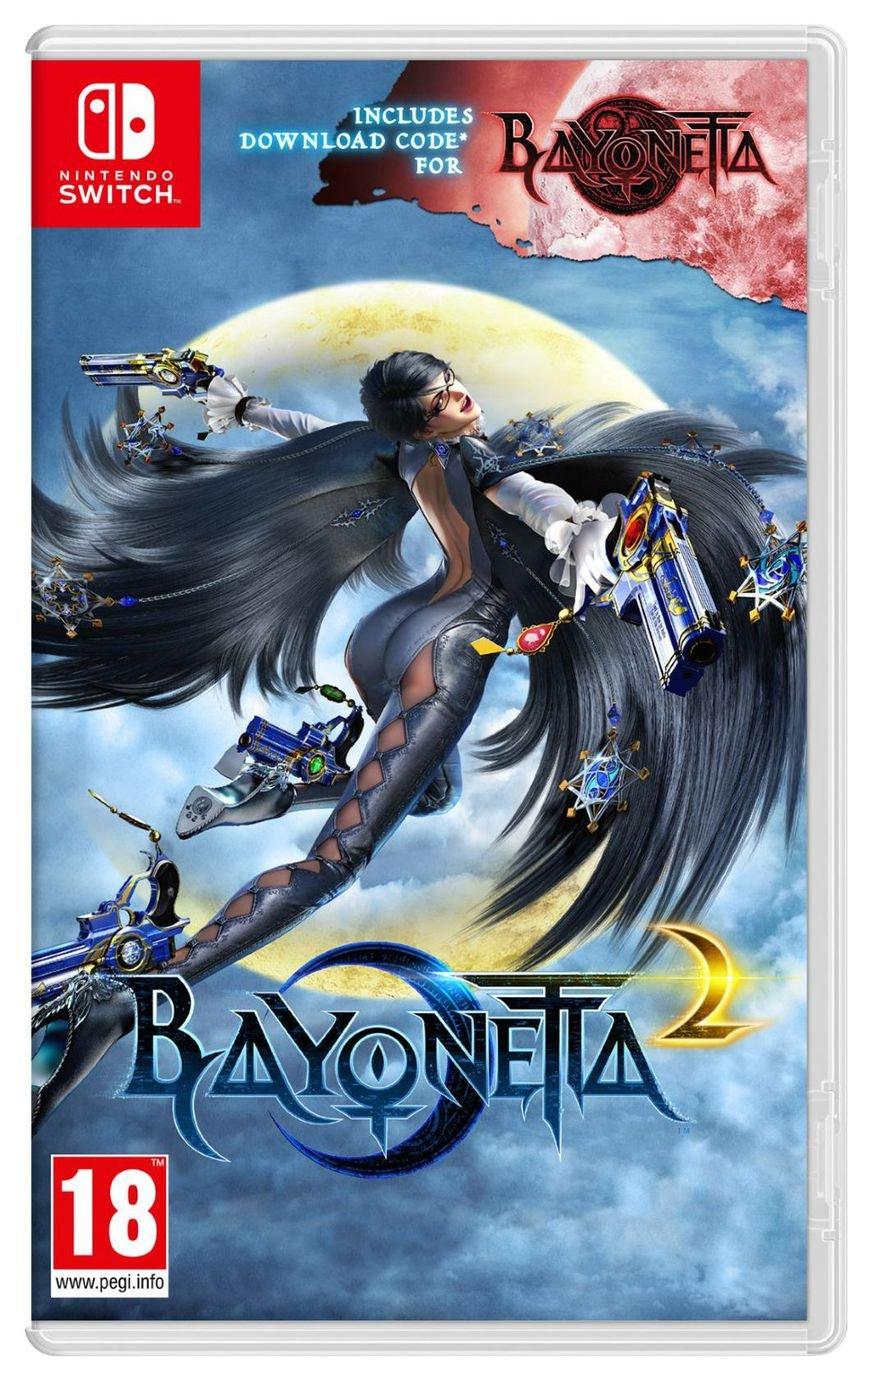 Bayonetta 2 with Bayonetta DDC Nintendo Switch Game £29.99 Argos (limited stock availability)